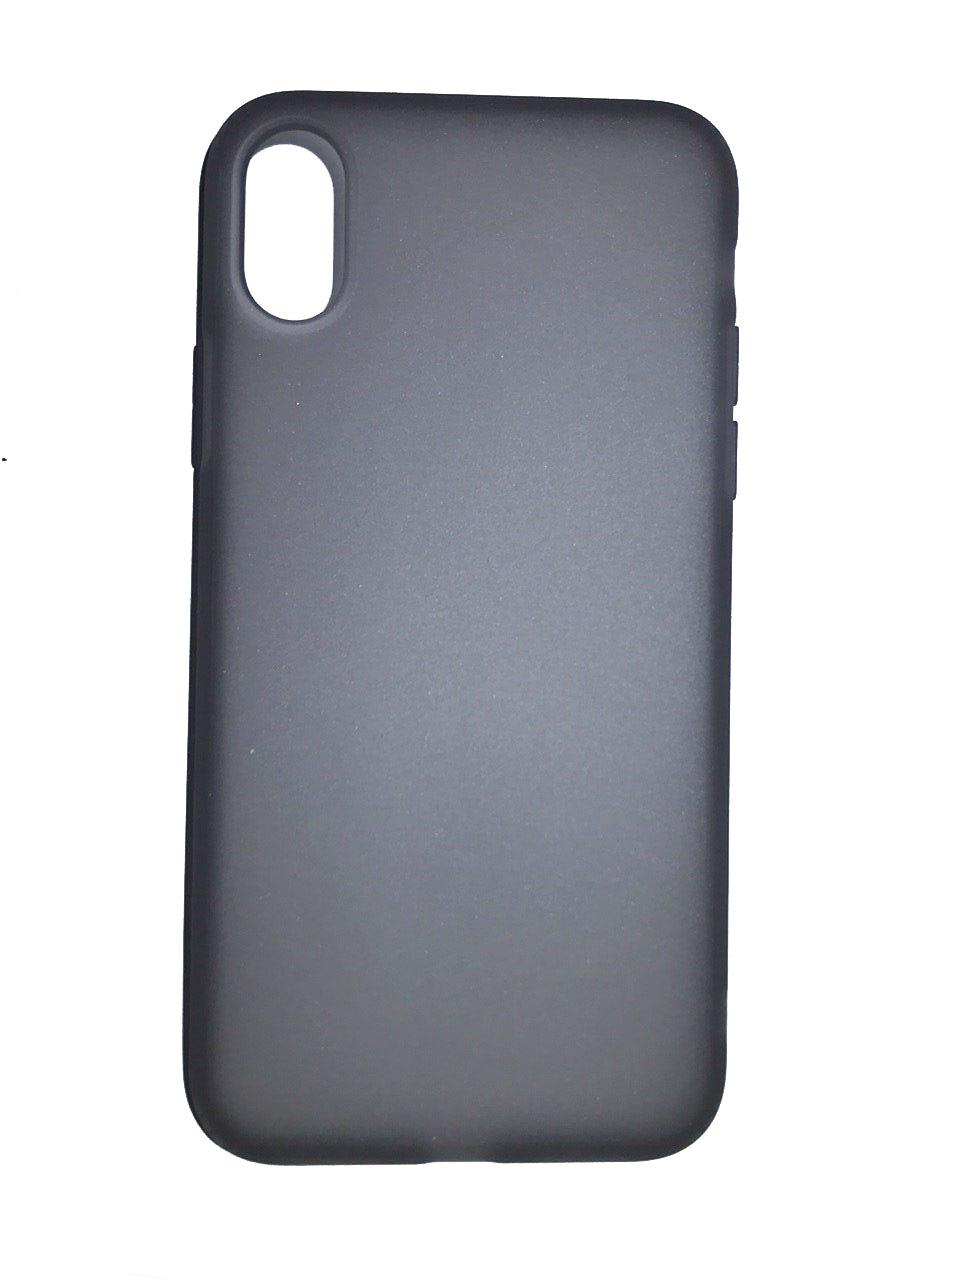 Чехол для сотового телефона Benks Чехол for iPhone X силикон (Grey), серый glare free screen protector with cleaning cloth for iphone 3g